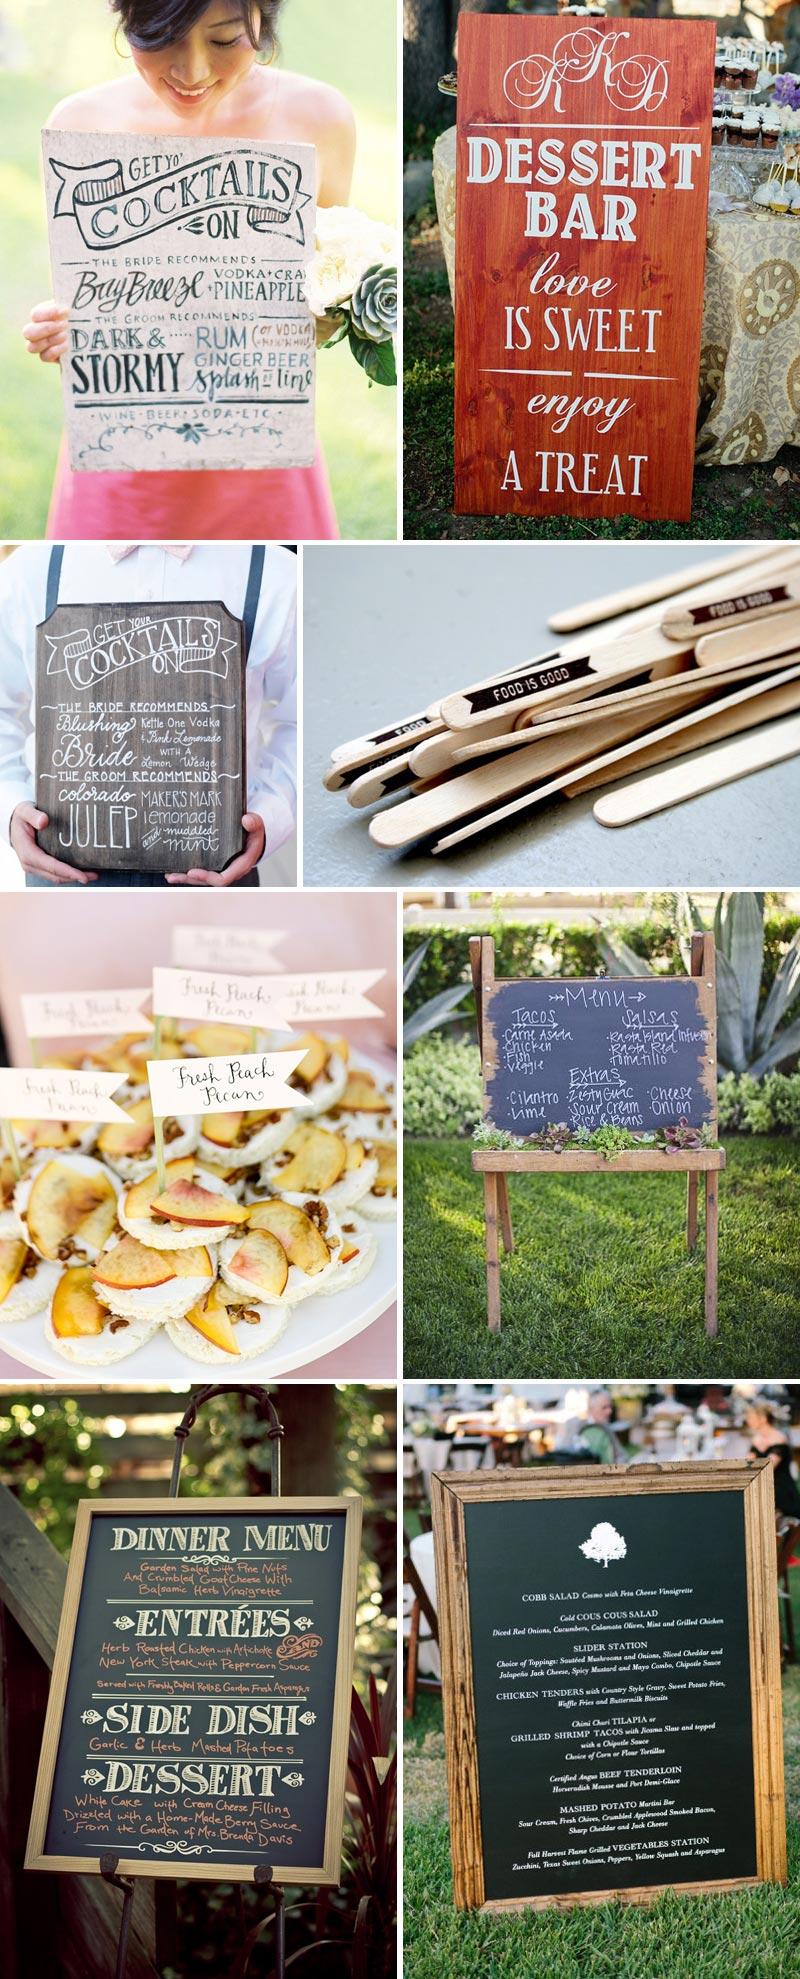 Looks-Good-Enough-To-Eat Wedding Menu Large Sign Inspiration